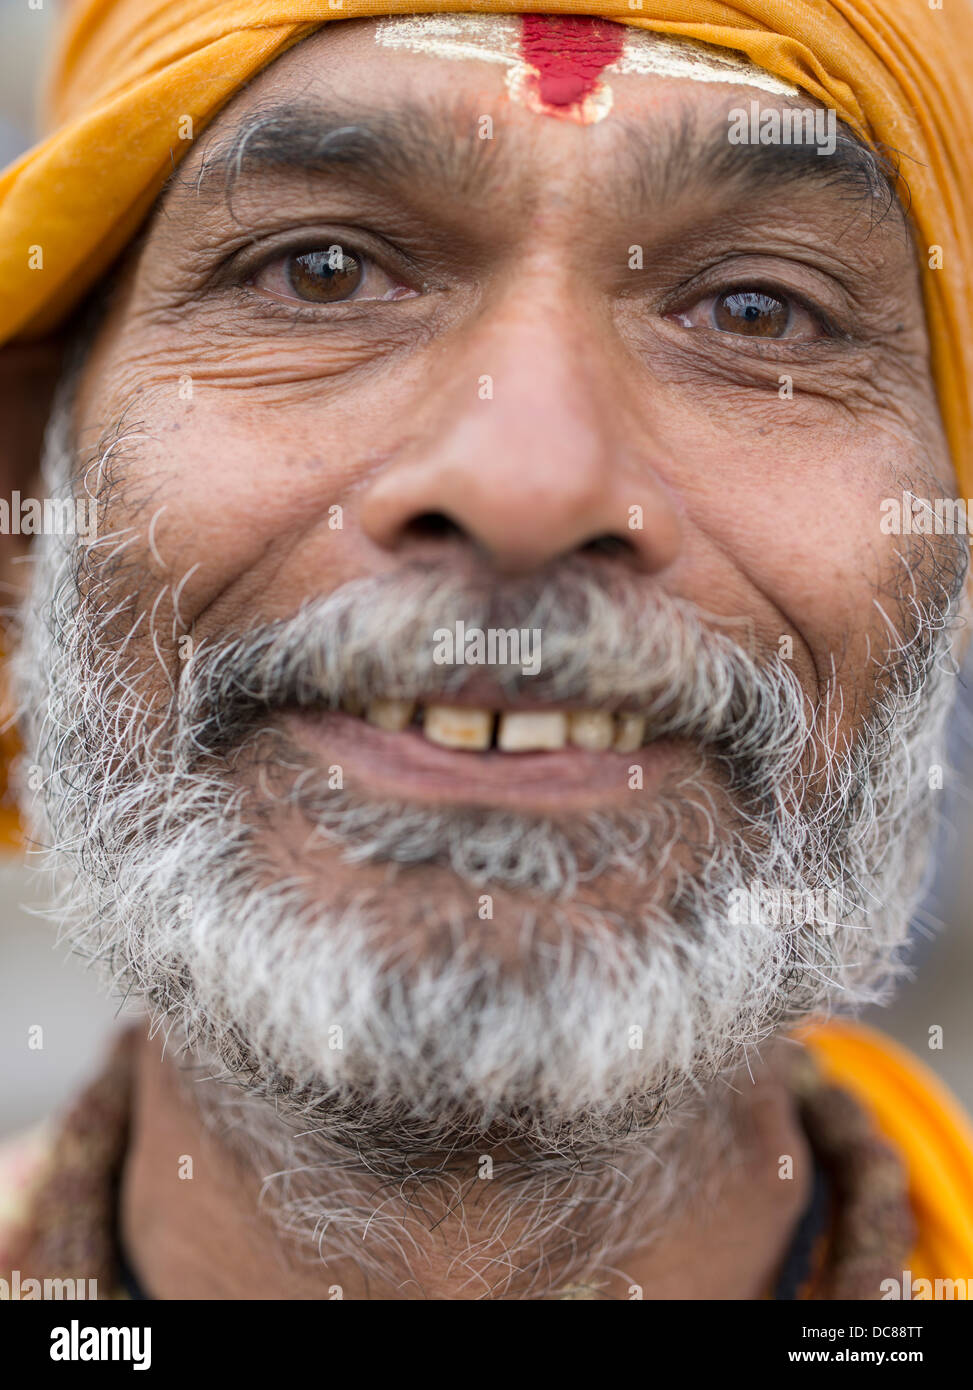 Sadhu holy man on the banks of the Ganges River - Varanasi, India - Stock Image